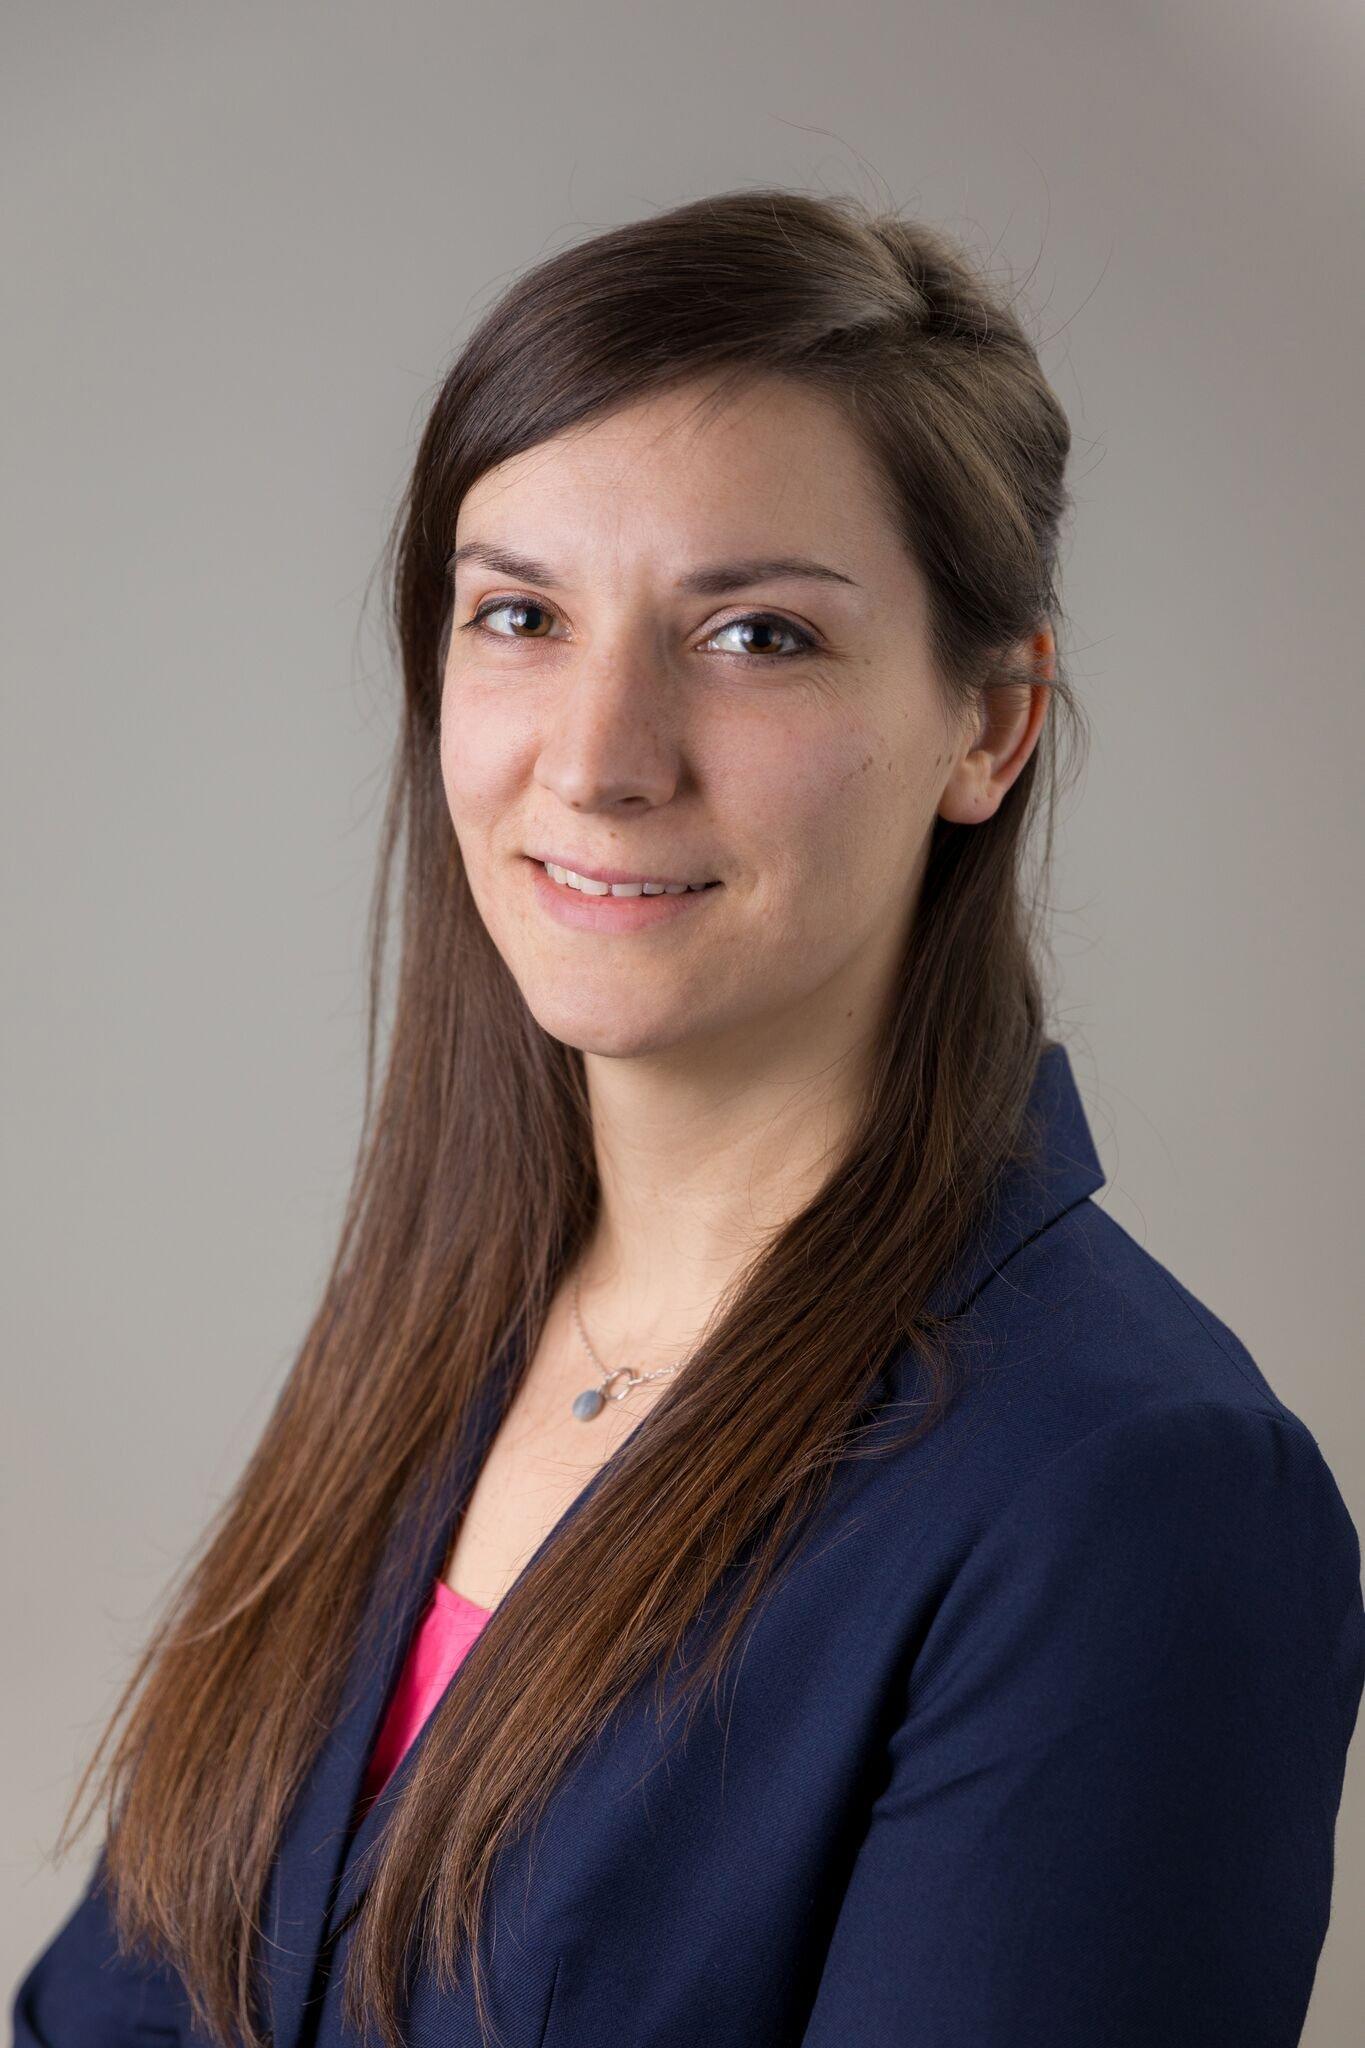 Lisa Deuel Movement Disorders Fellowship